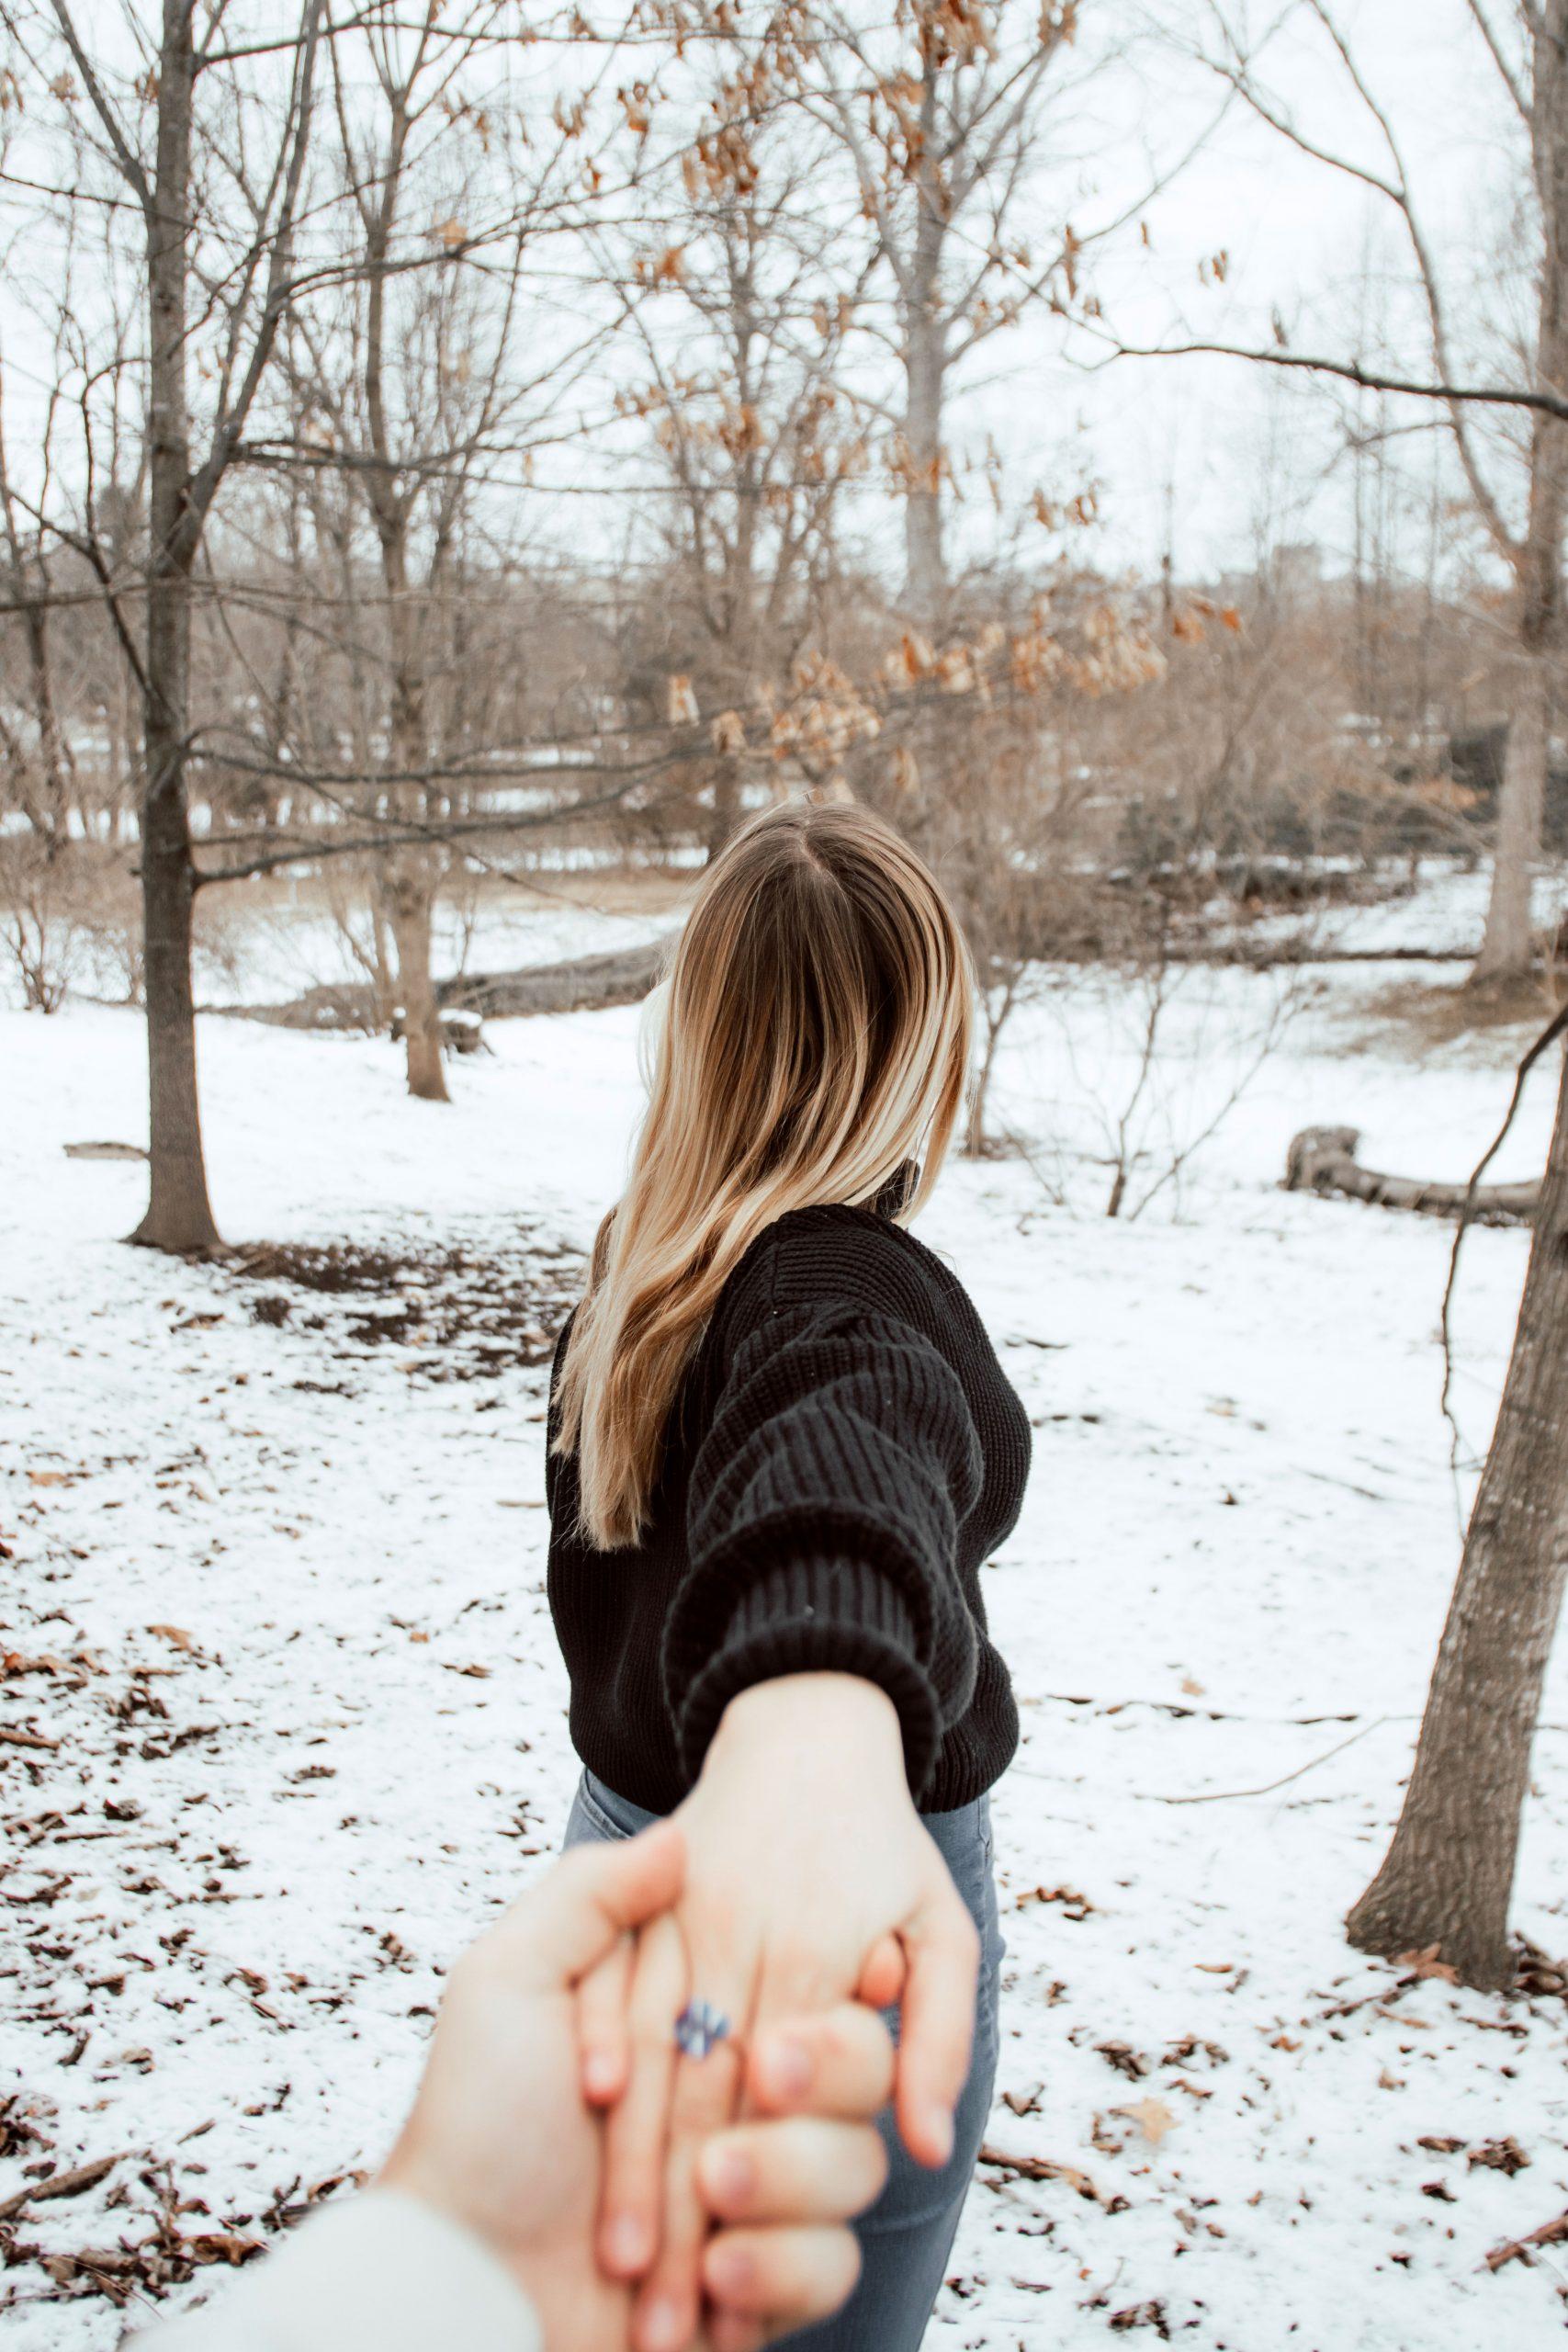 Love Couple Sad Dp Images pictures pics free hd